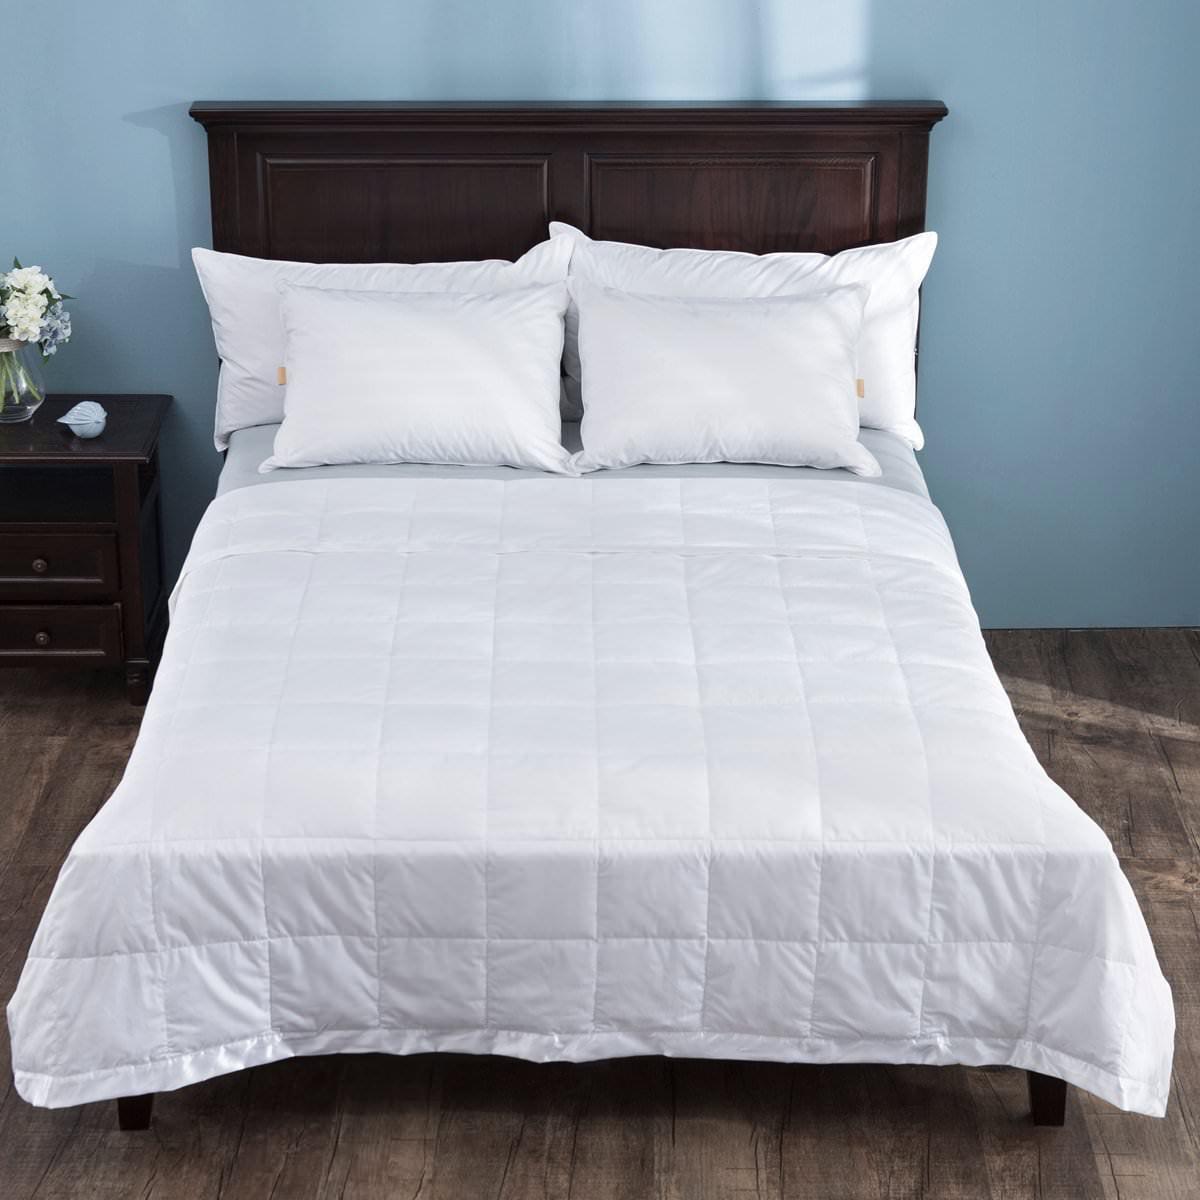 06b6cf859c Puredown Light Weight White Down Blanket With Satin Weave